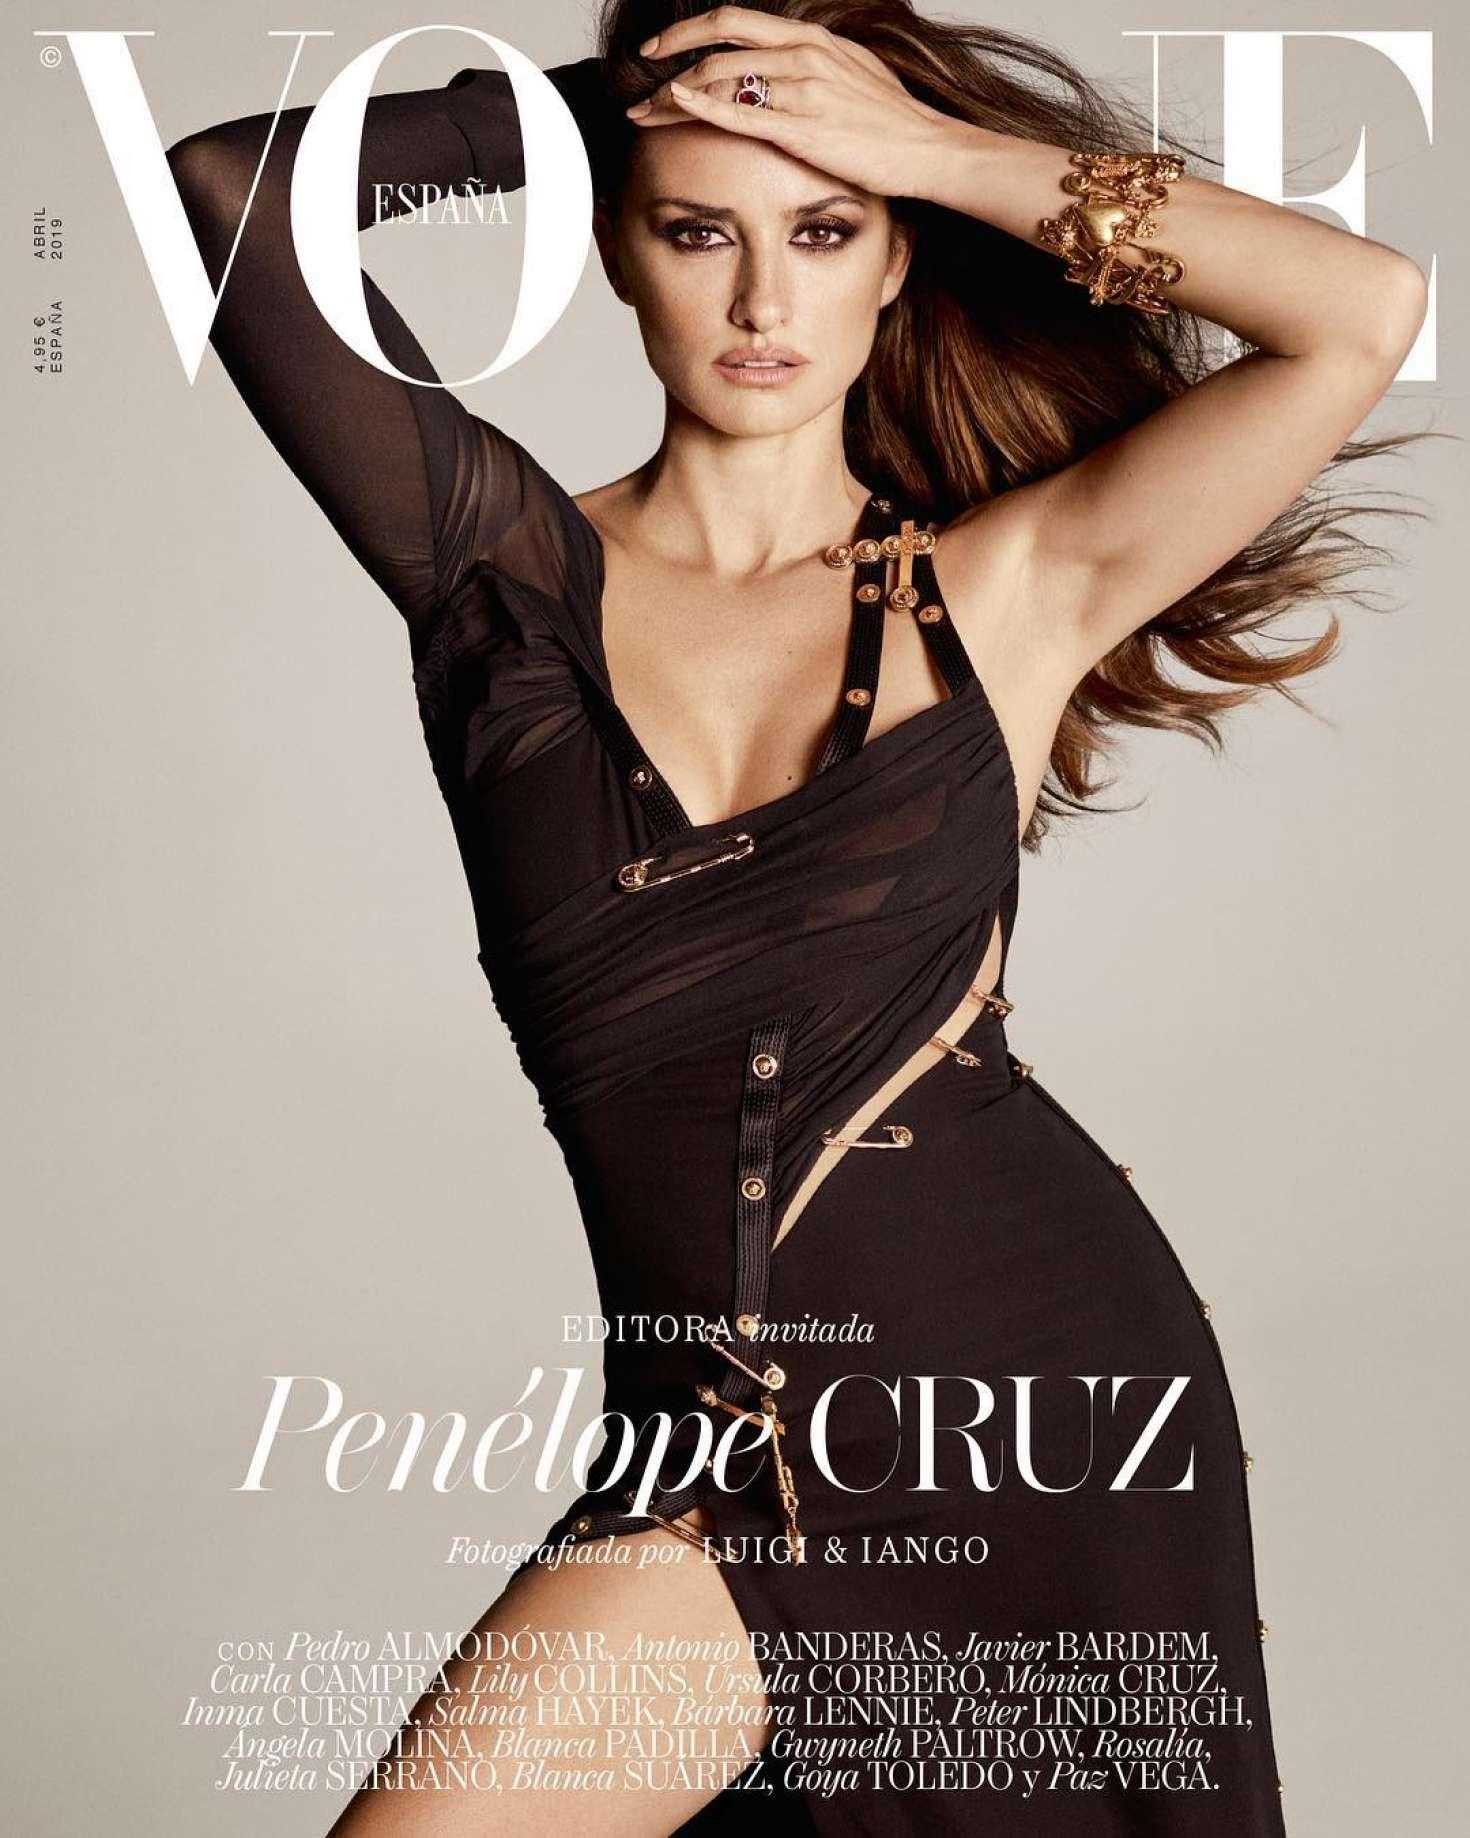 Penelope Cruz - Vogue Spain Cover (April 2019)